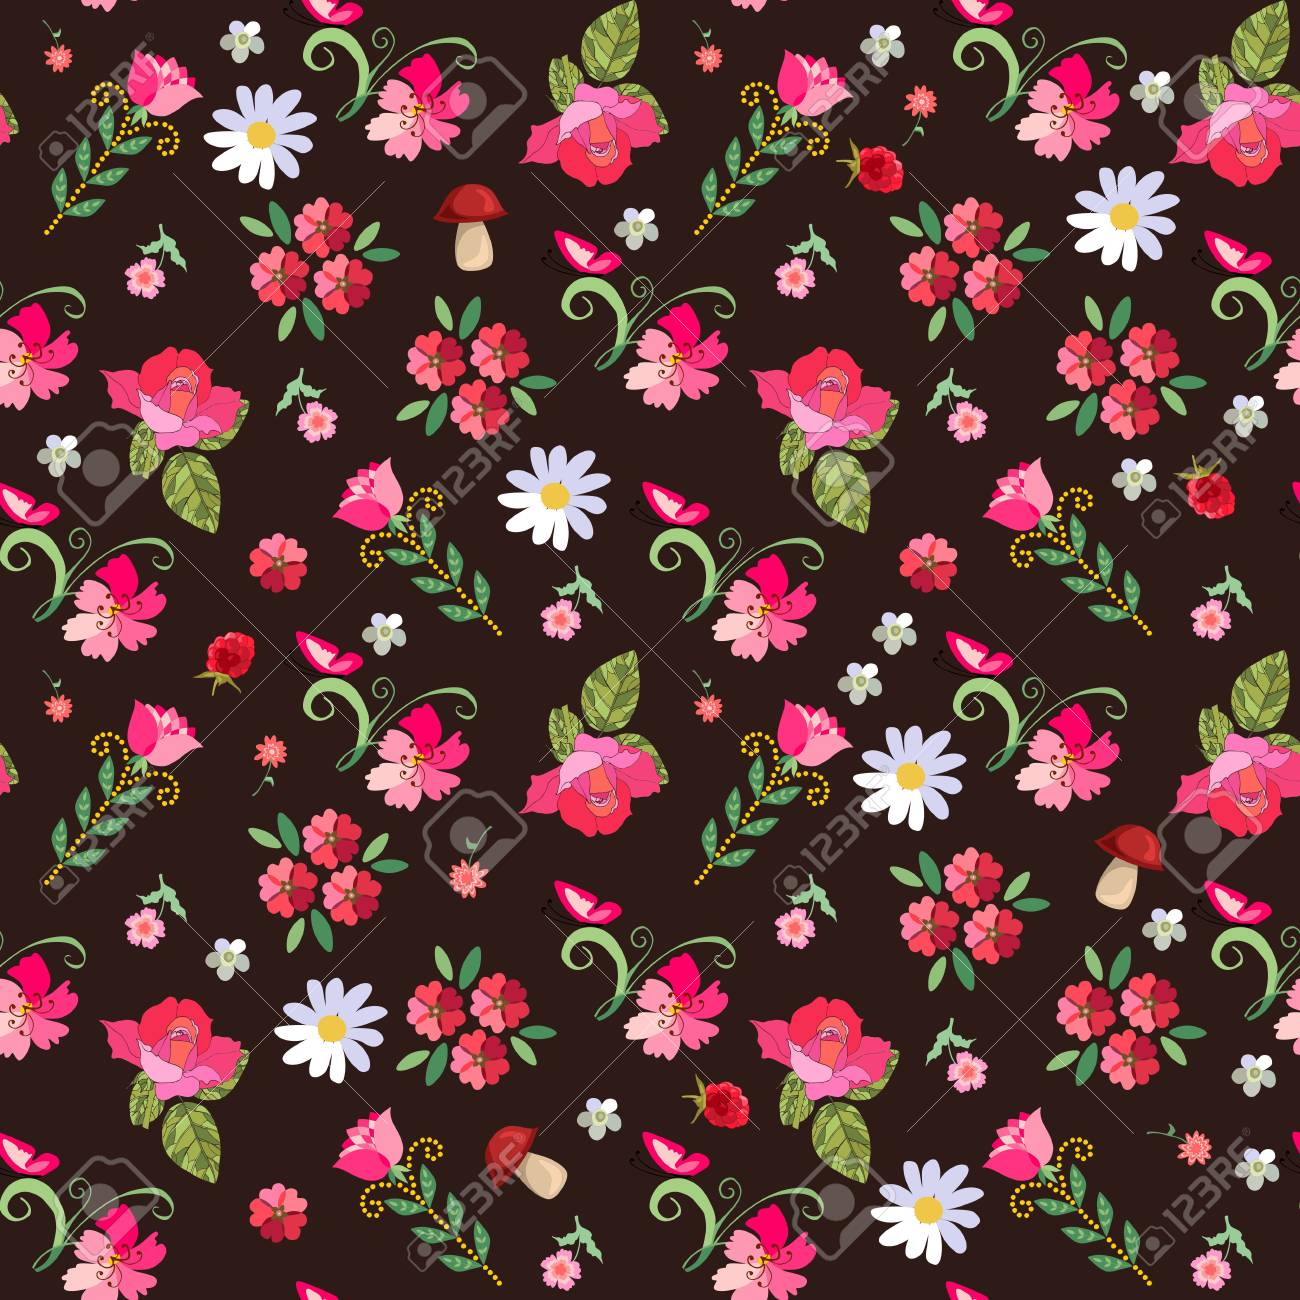 Bonito Sem Costura Padrao Floral Com Rosas Margaridas Framboesas